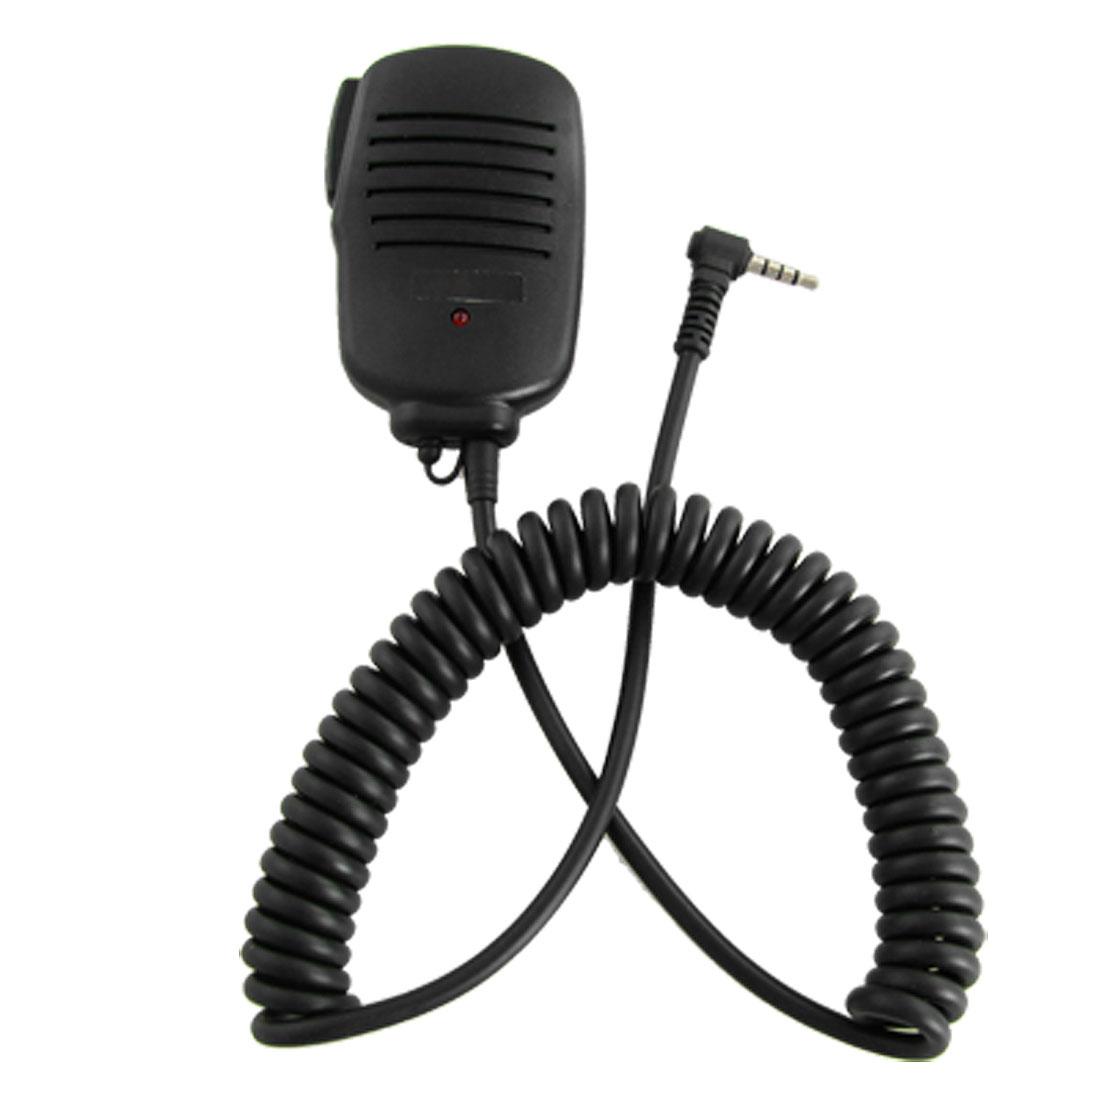 3.5mm Connector Handheld Speaker Mic for Vertex VX-10 VDF-20 FT-10